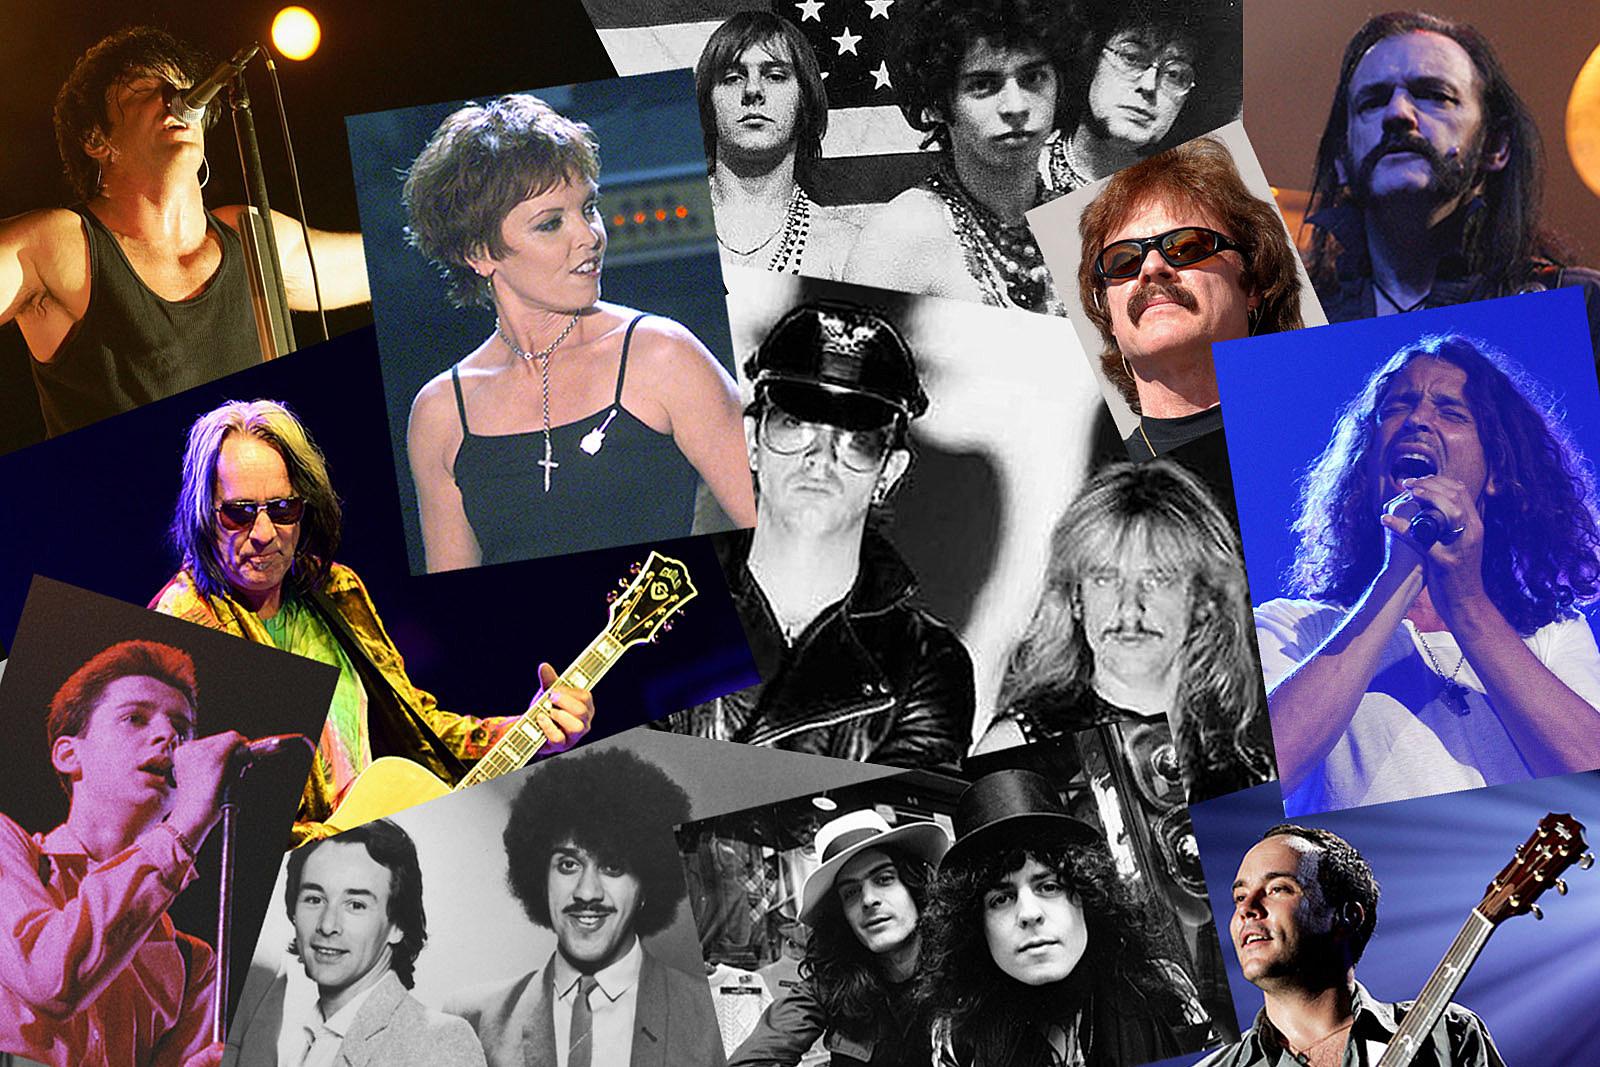 Doobie Brothers, Judas Priest, Soundgarden Lead New Rock Hall Nominations